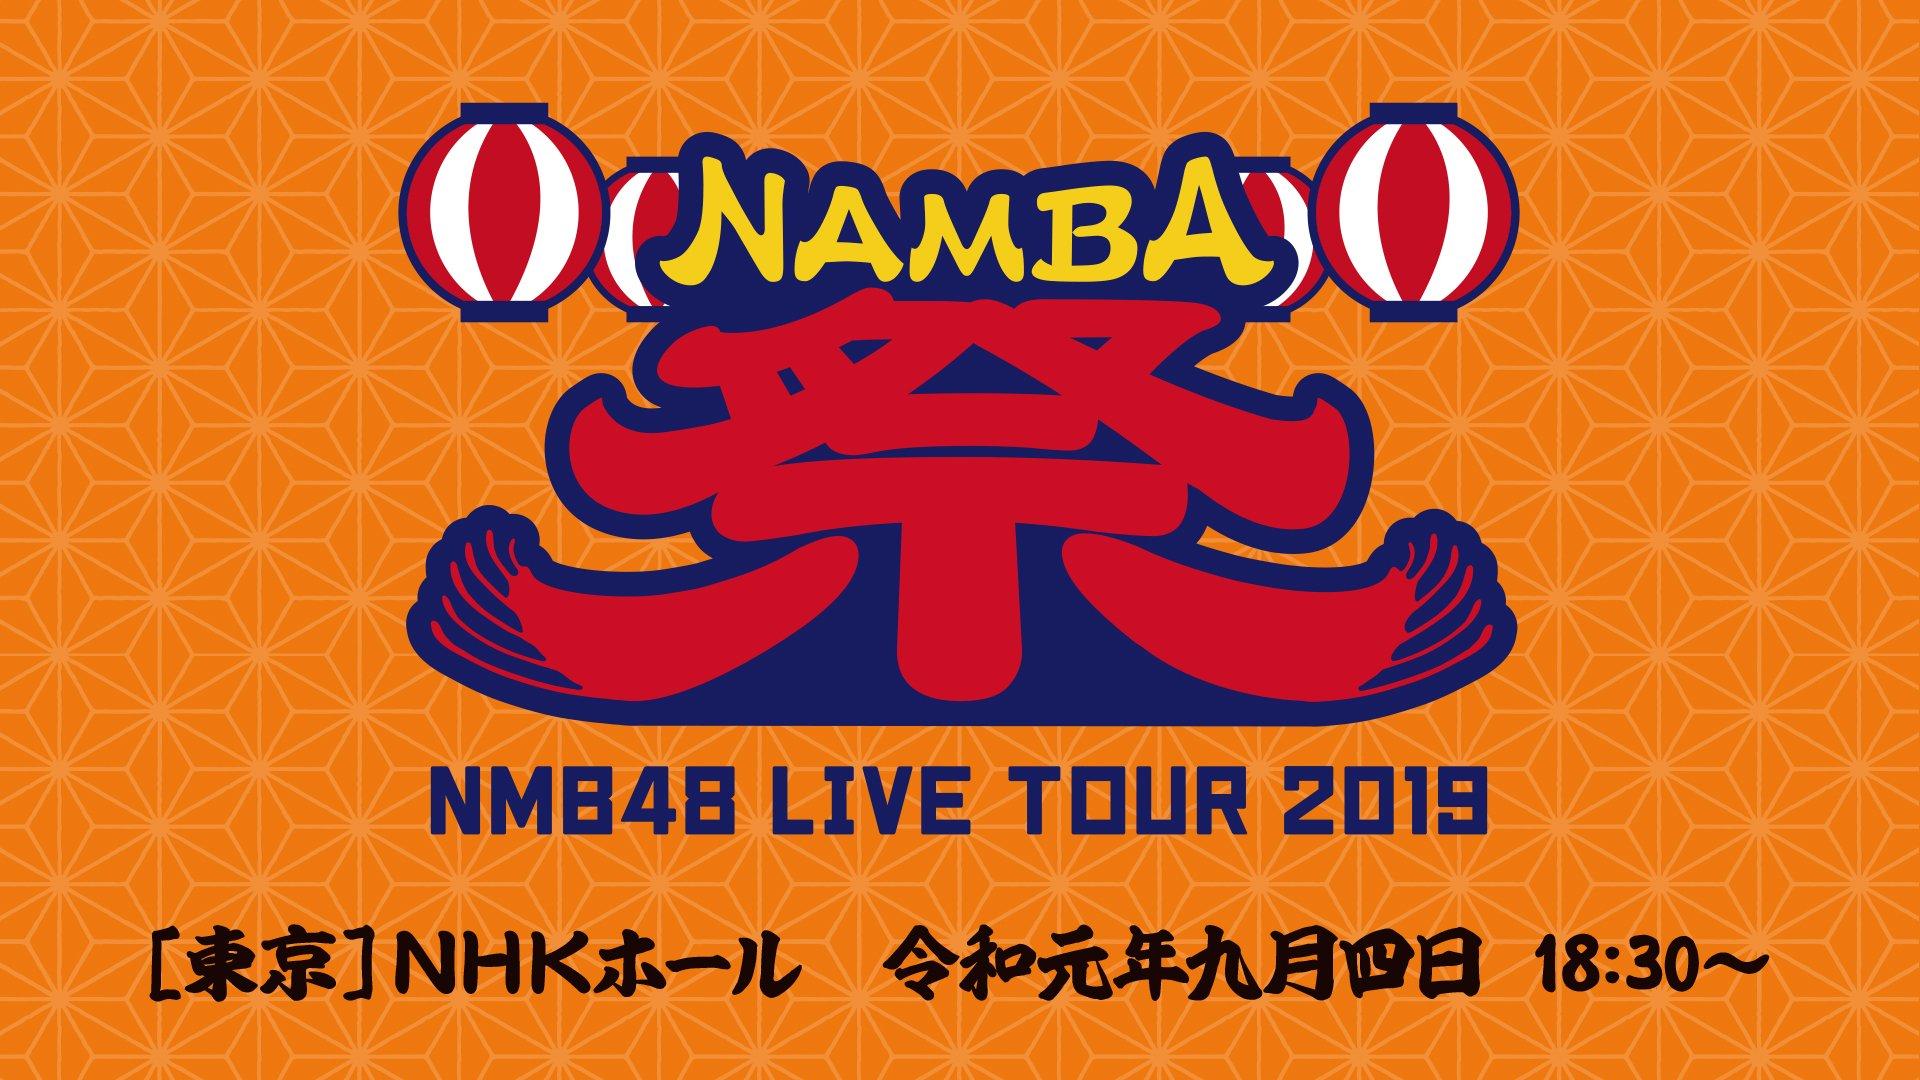 【NMB48】9月4日東京 NHKホール「NMB48 LIVE TOUR 2019 ~NAMBA祭~」が大阪チャンネルで配信決定